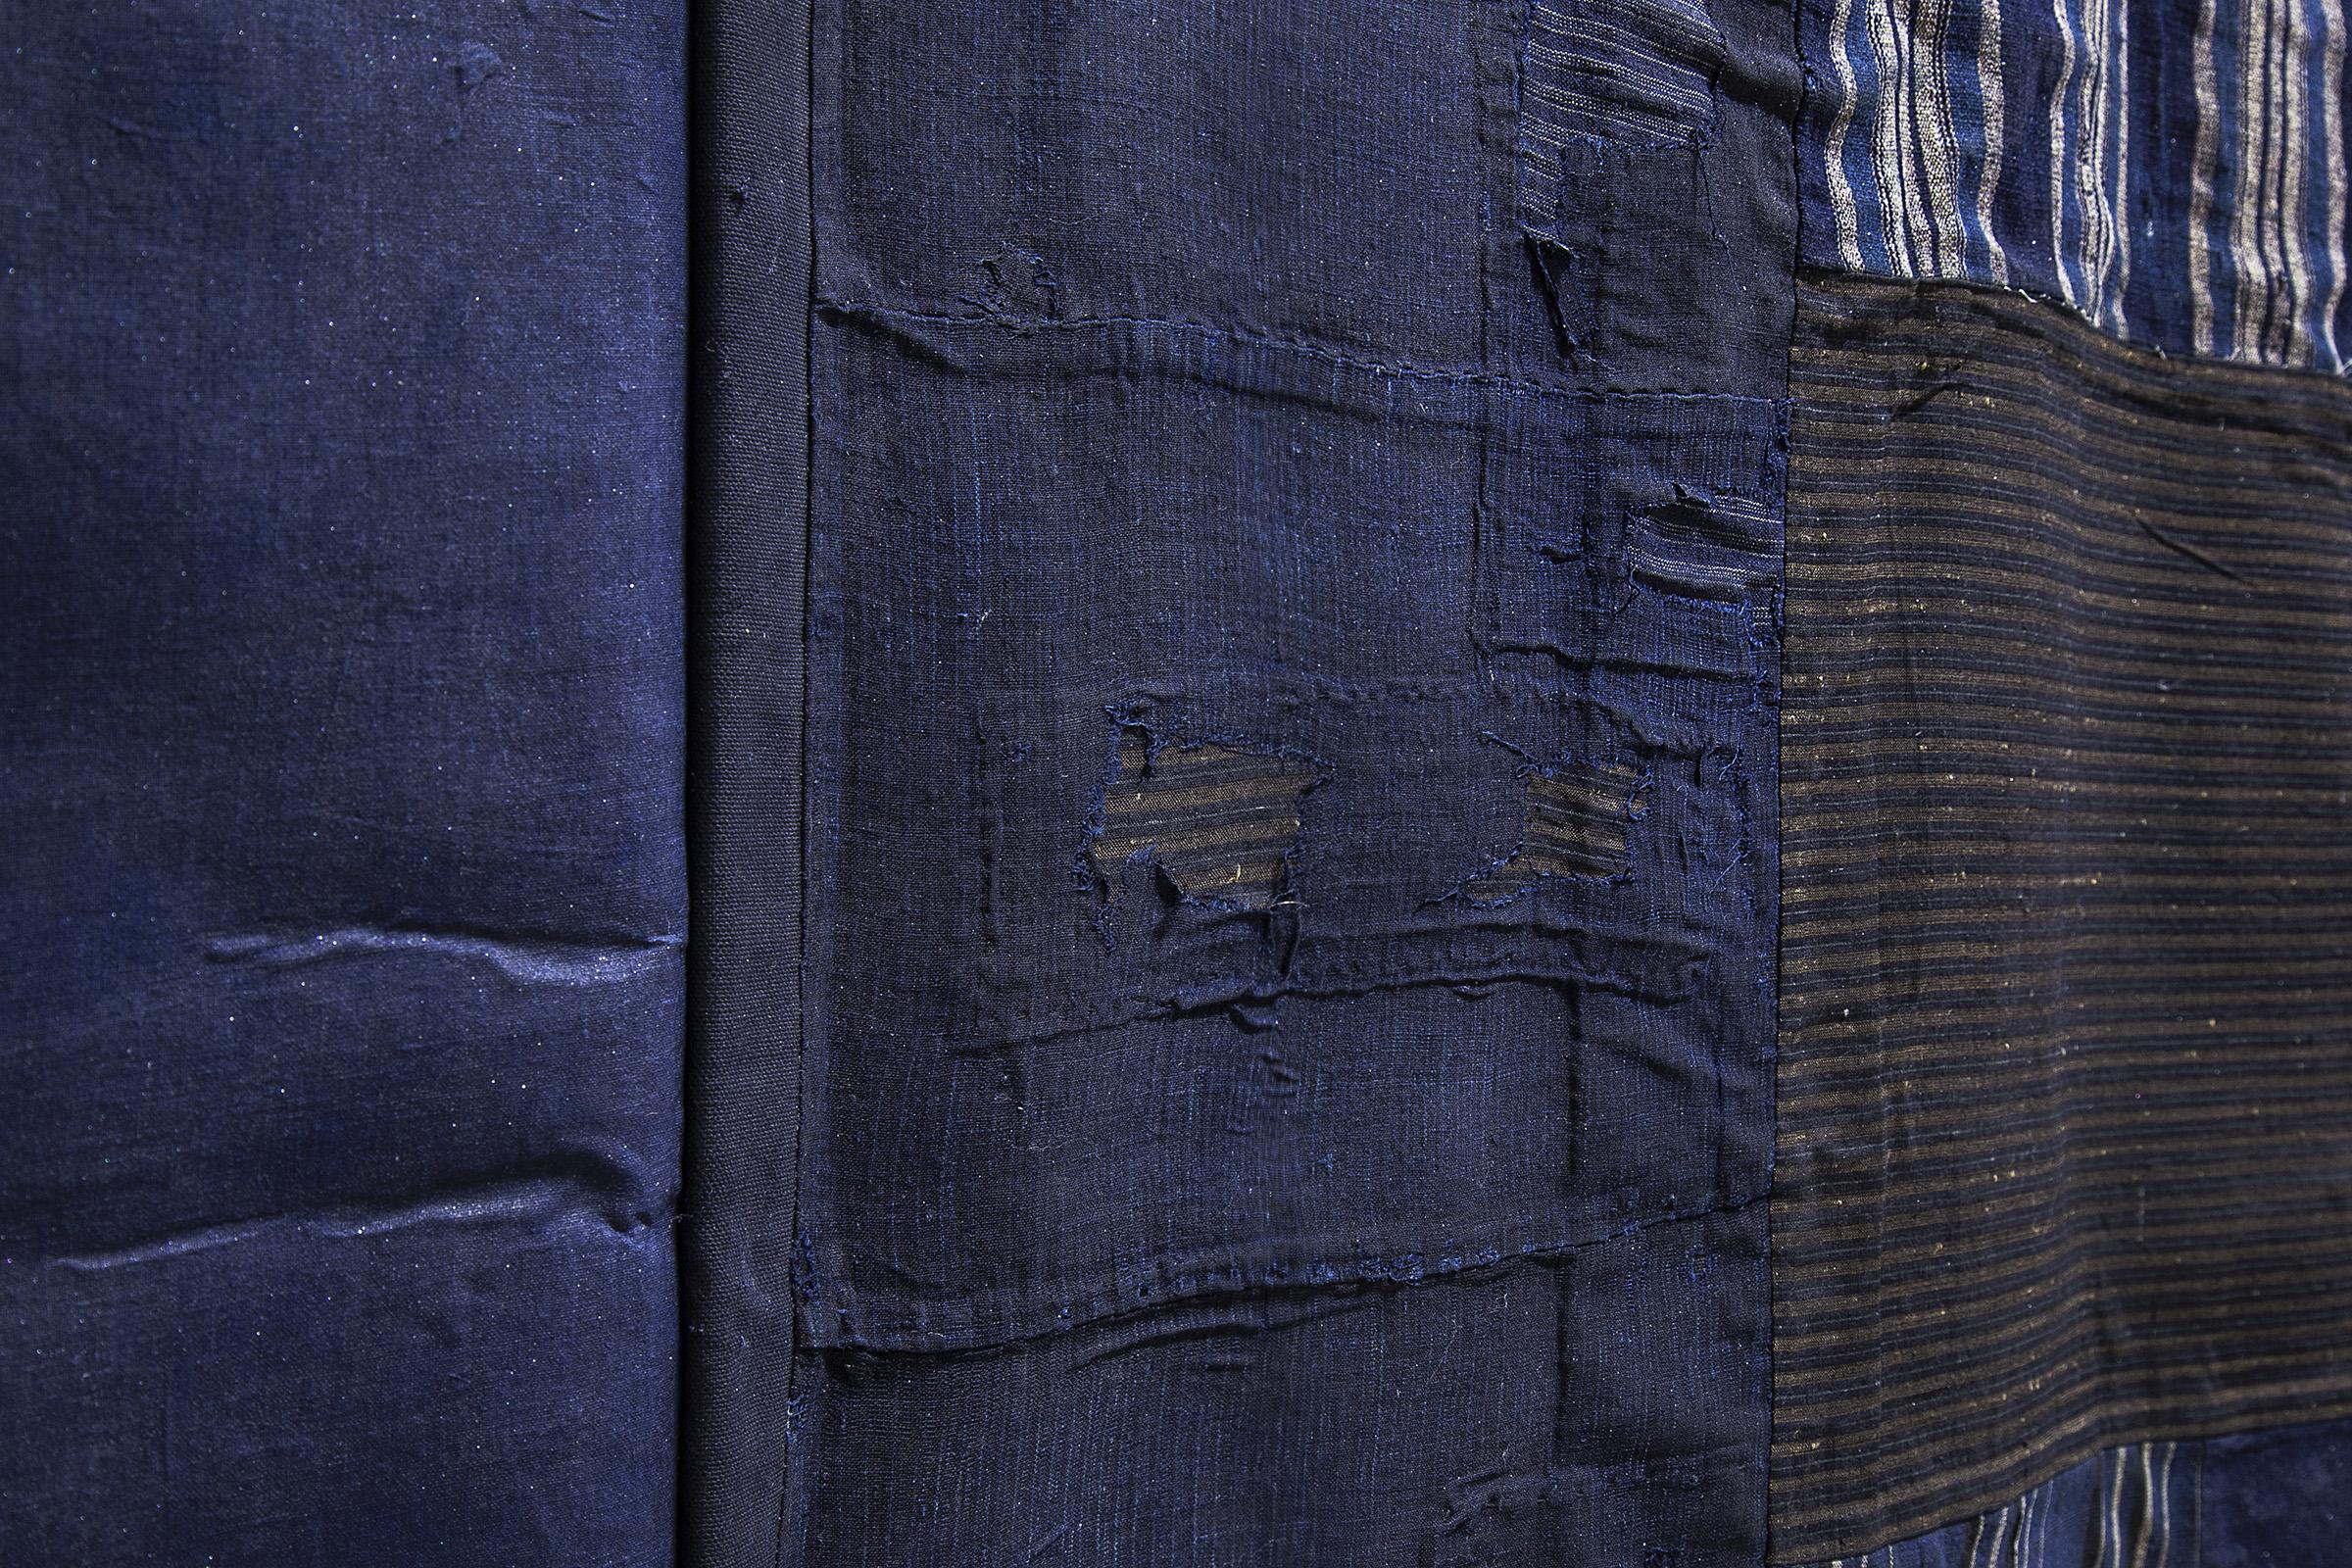 03_tapestry closeup